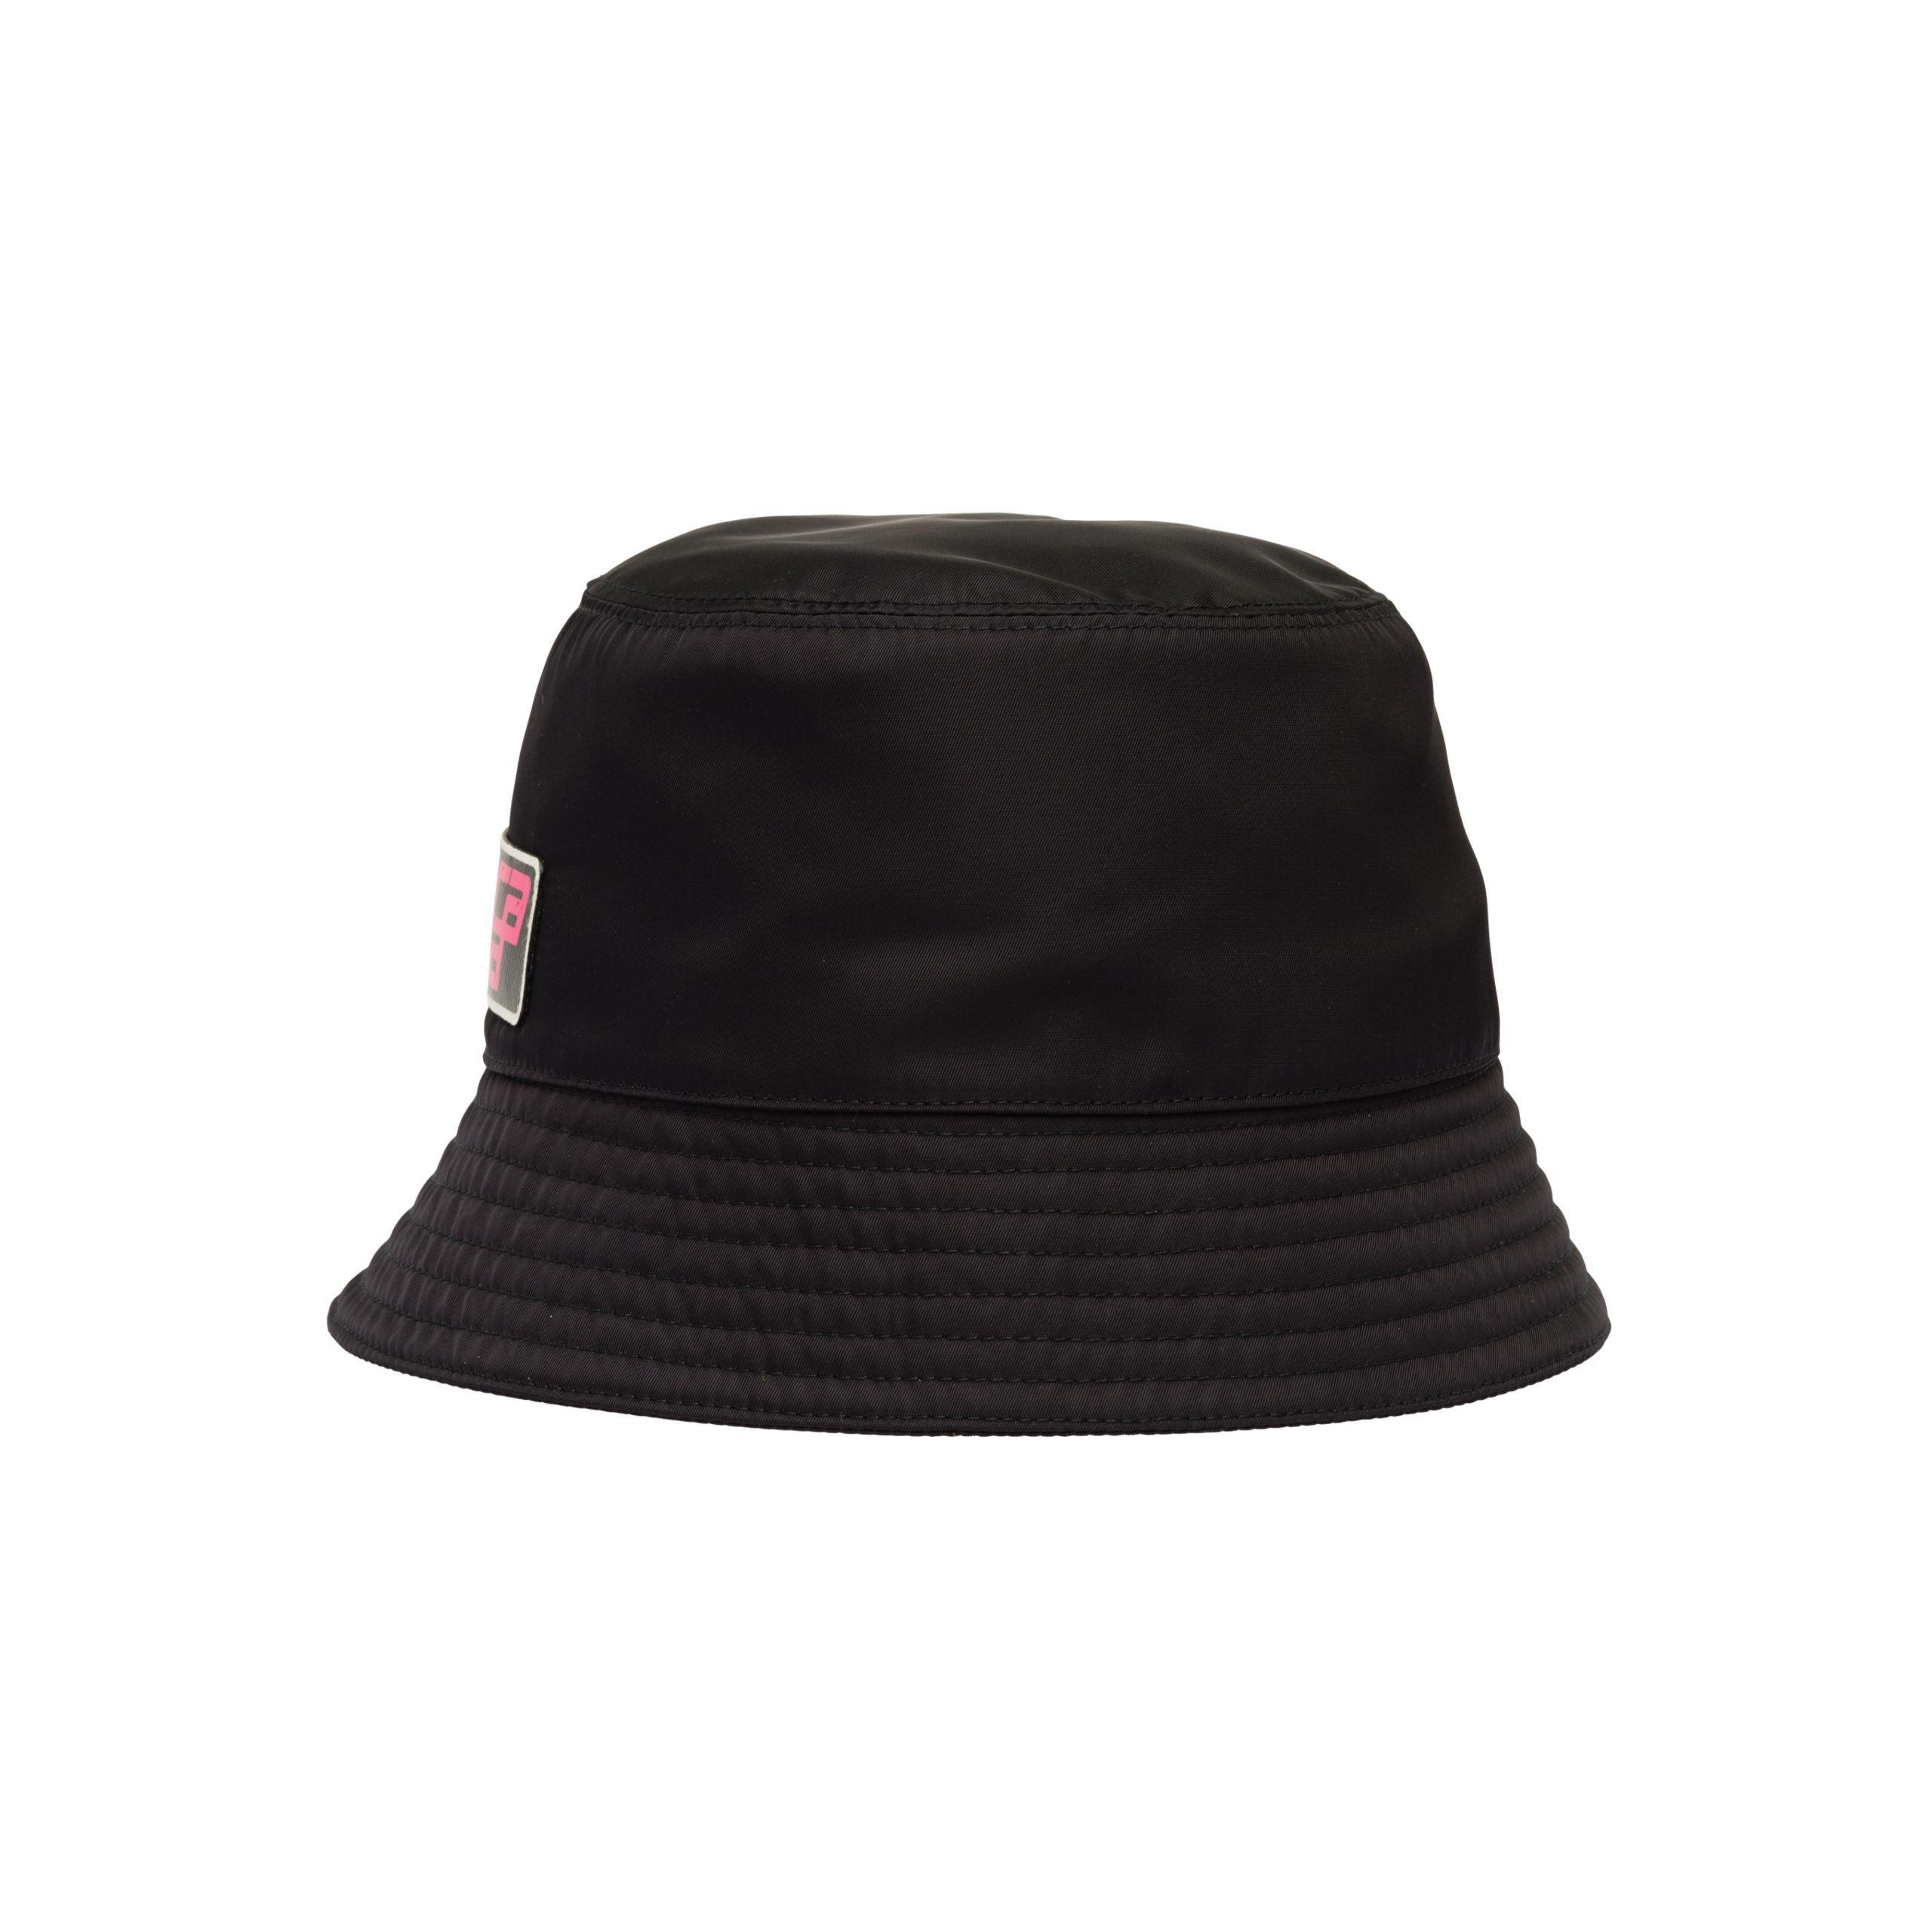 Prada. Women s Black Nylon Cap With Logo.  340 From Orchard Mile 8516b39134a3